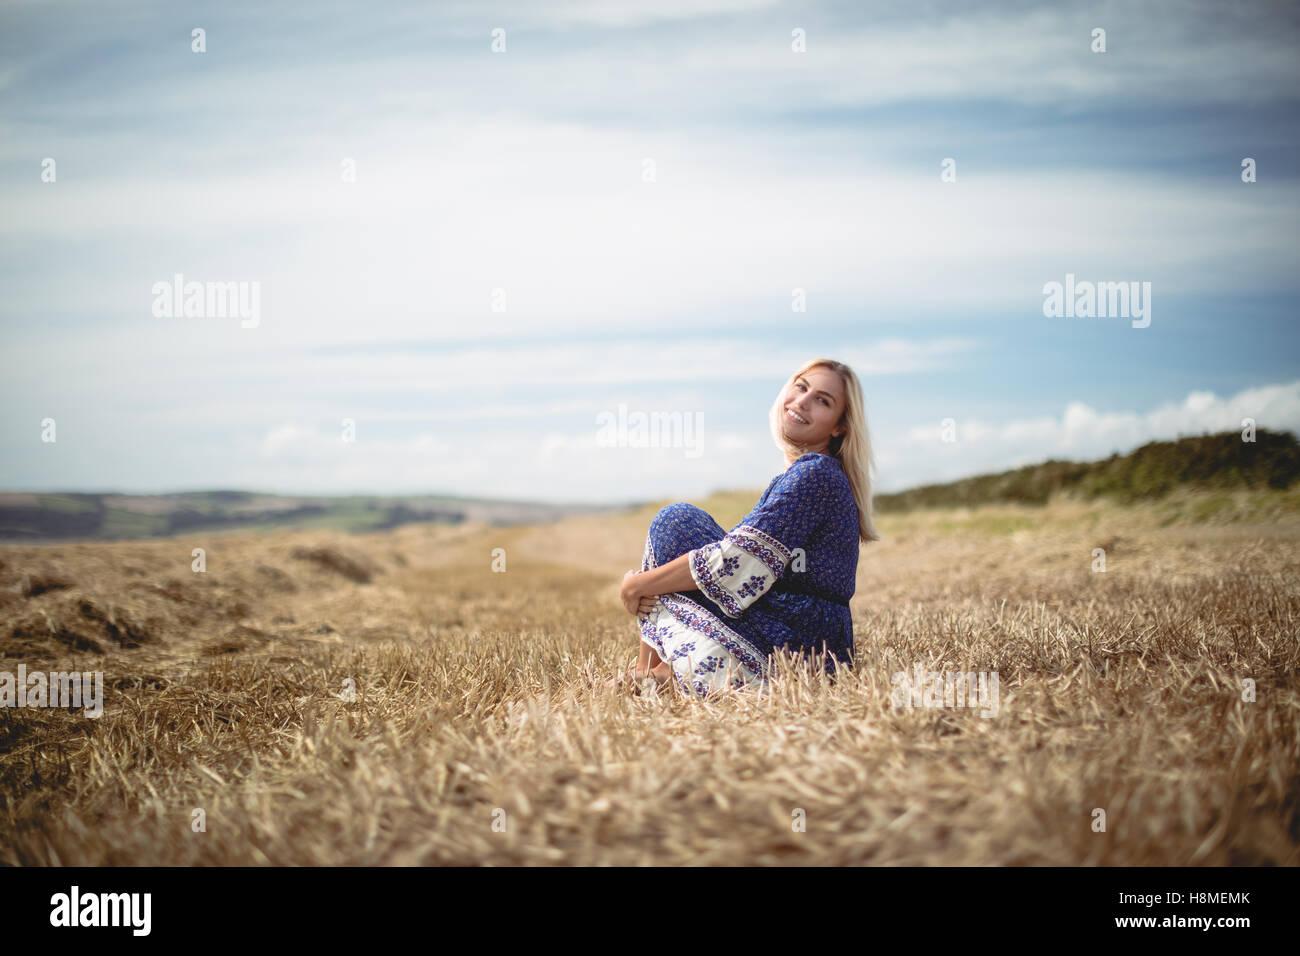 Blonde woman sitting in field - Stock Image